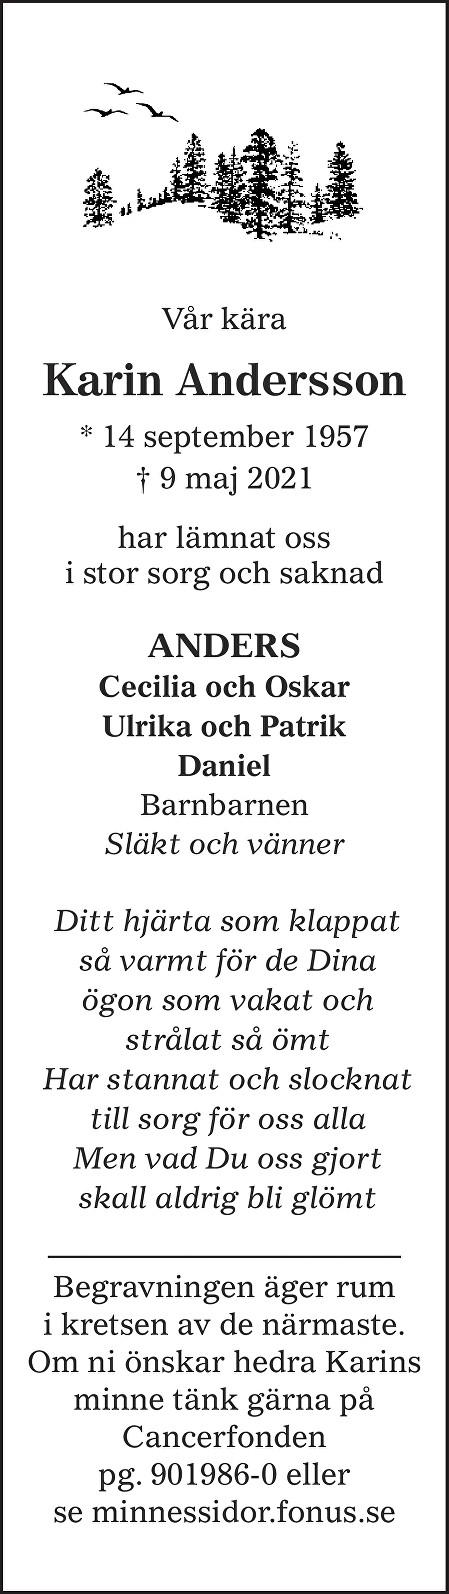 Karin Andersson Death notice